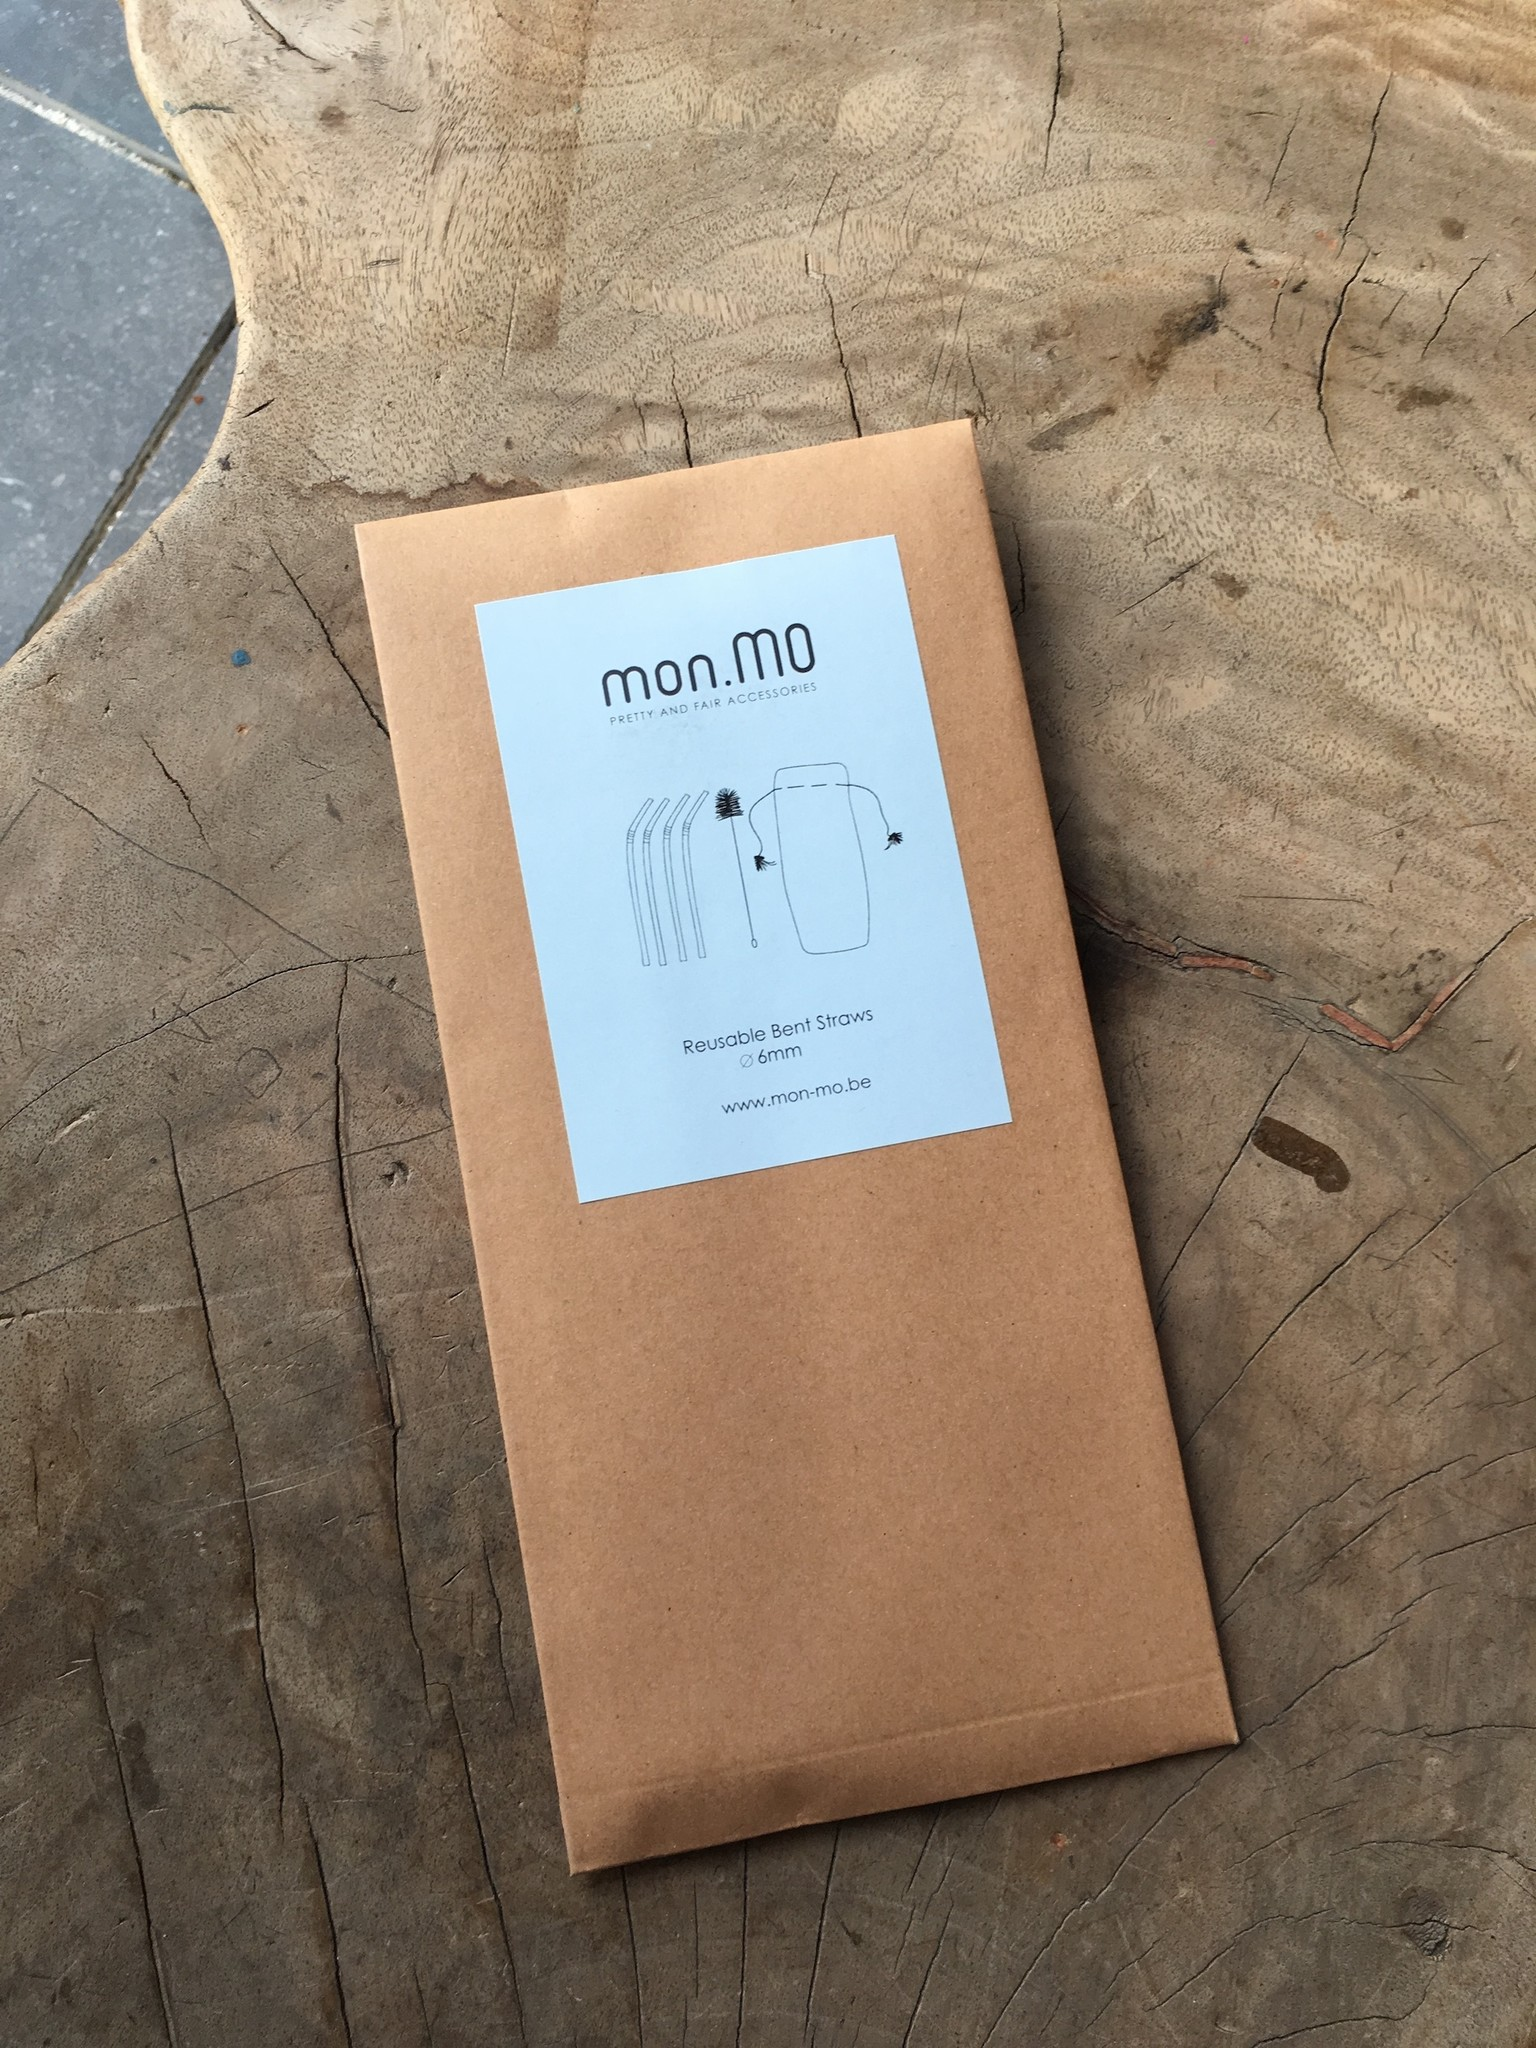 mon.MO Herbruikbare Gebogen Rietjes - 4 pack met borstel en zakje